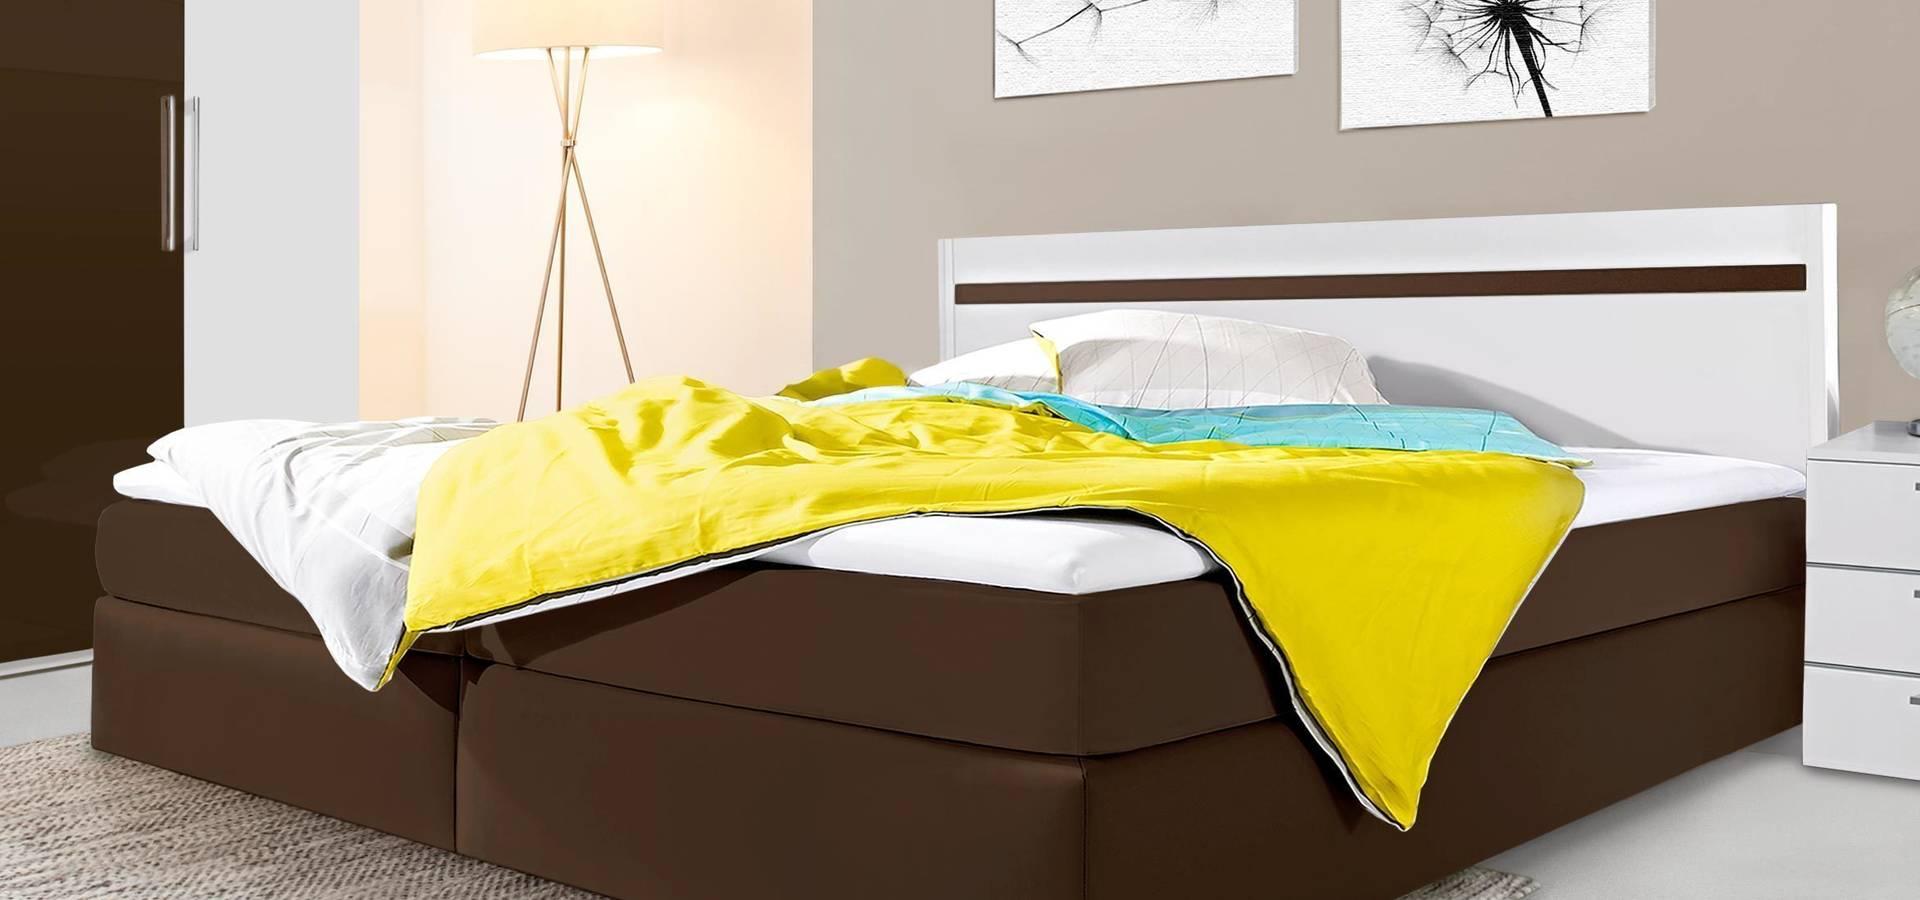 polsterbetten und boxspringbetten de m bel trend gmbh homify. Black Bedroom Furniture Sets. Home Design Ideas